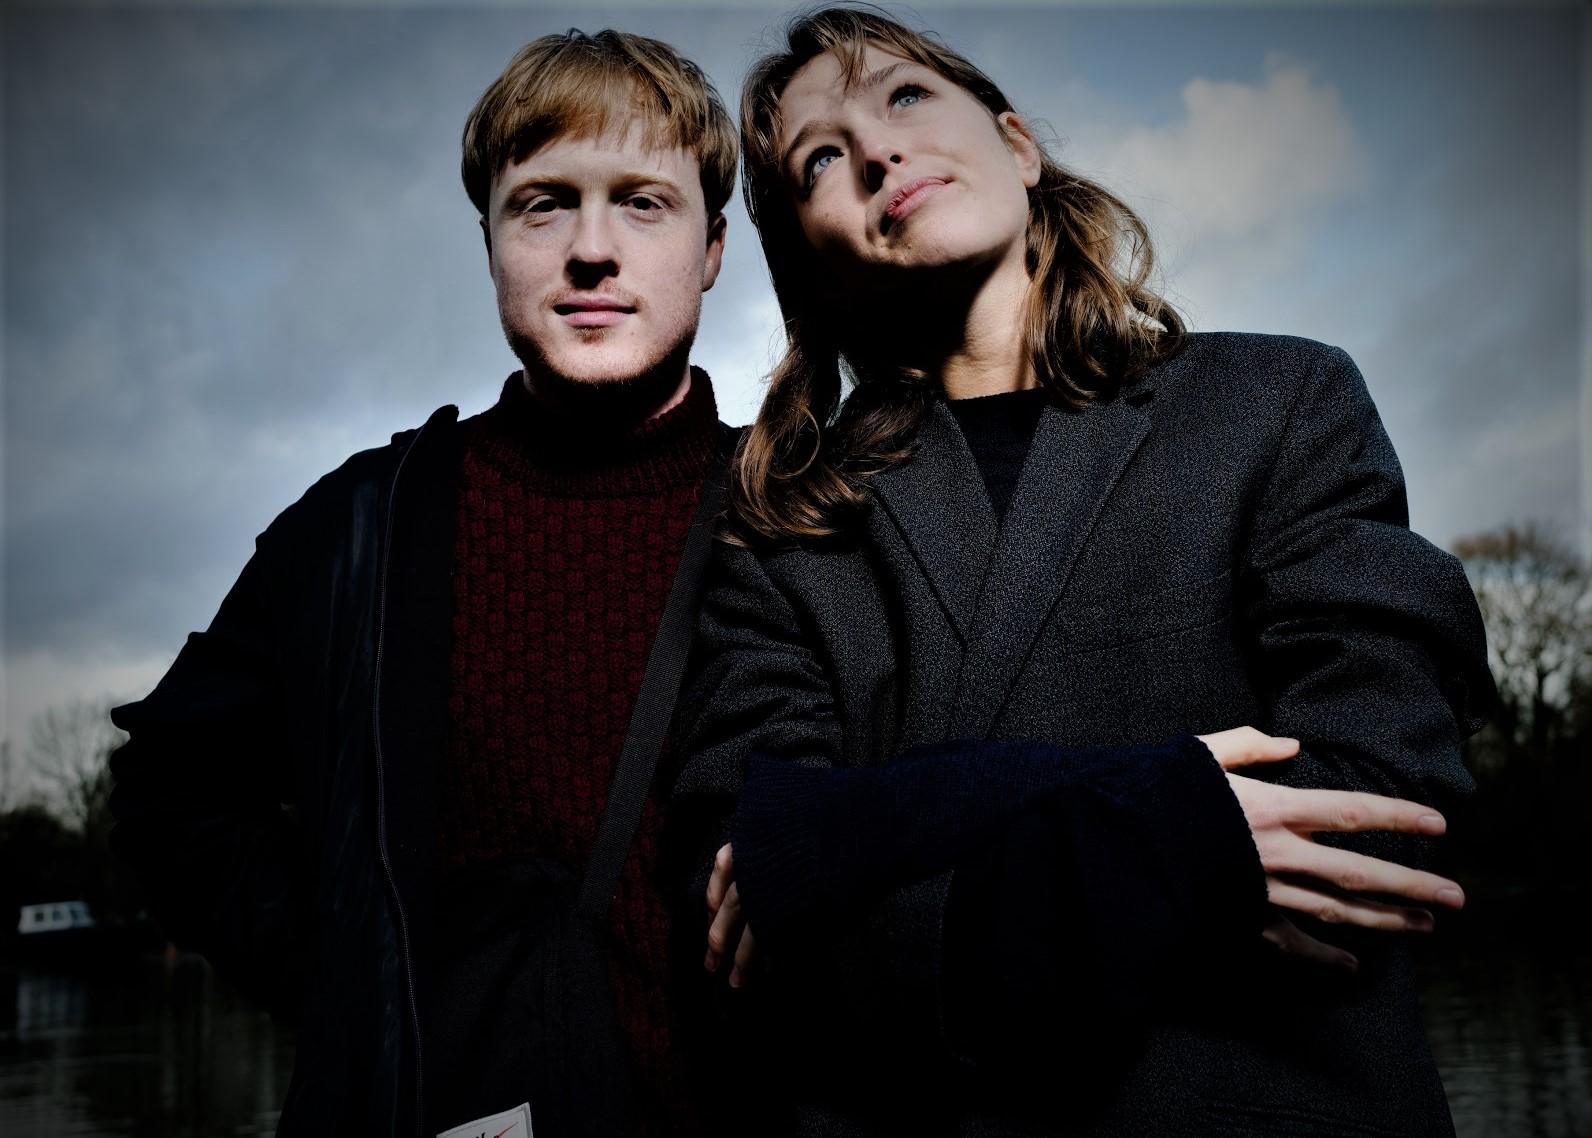 Duo Electro-Pop Luar Biasa Dari Masa Depan Retro